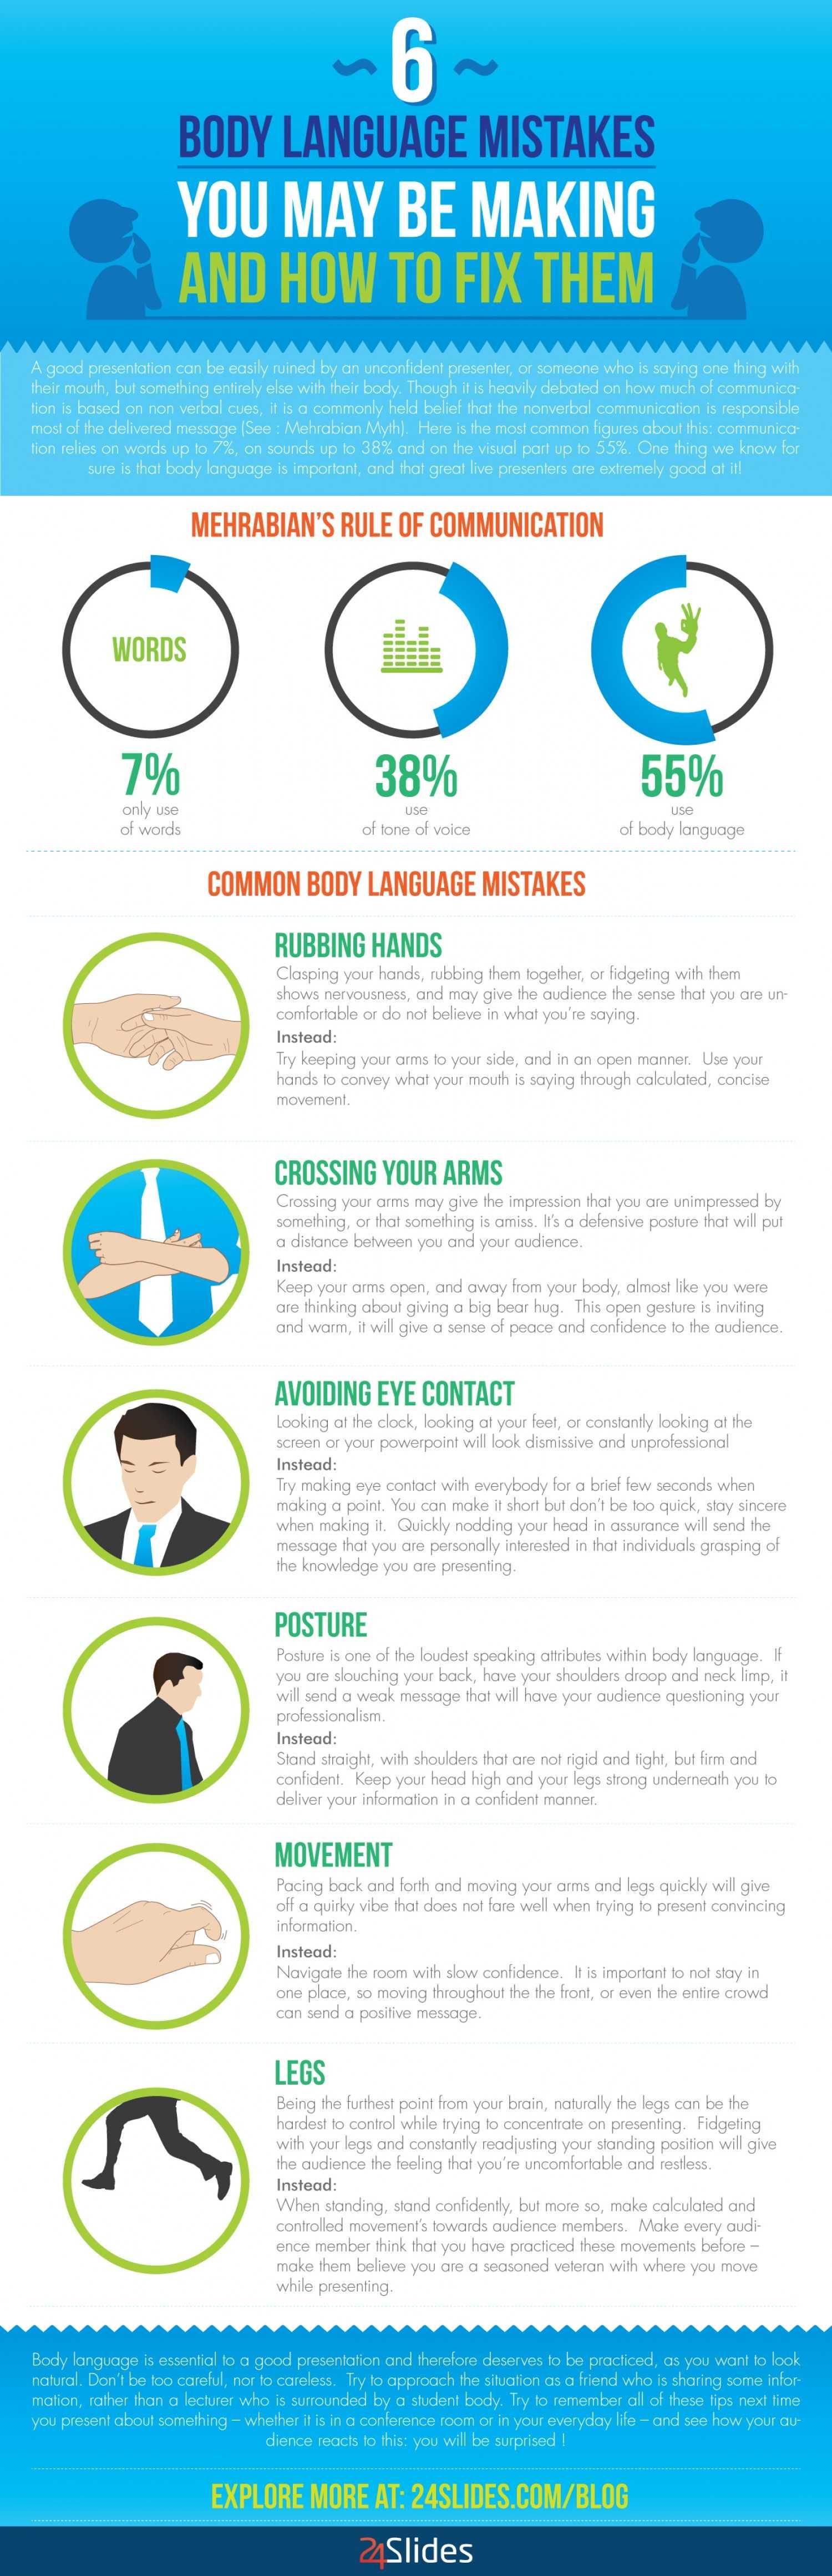 Body Language Mistakes